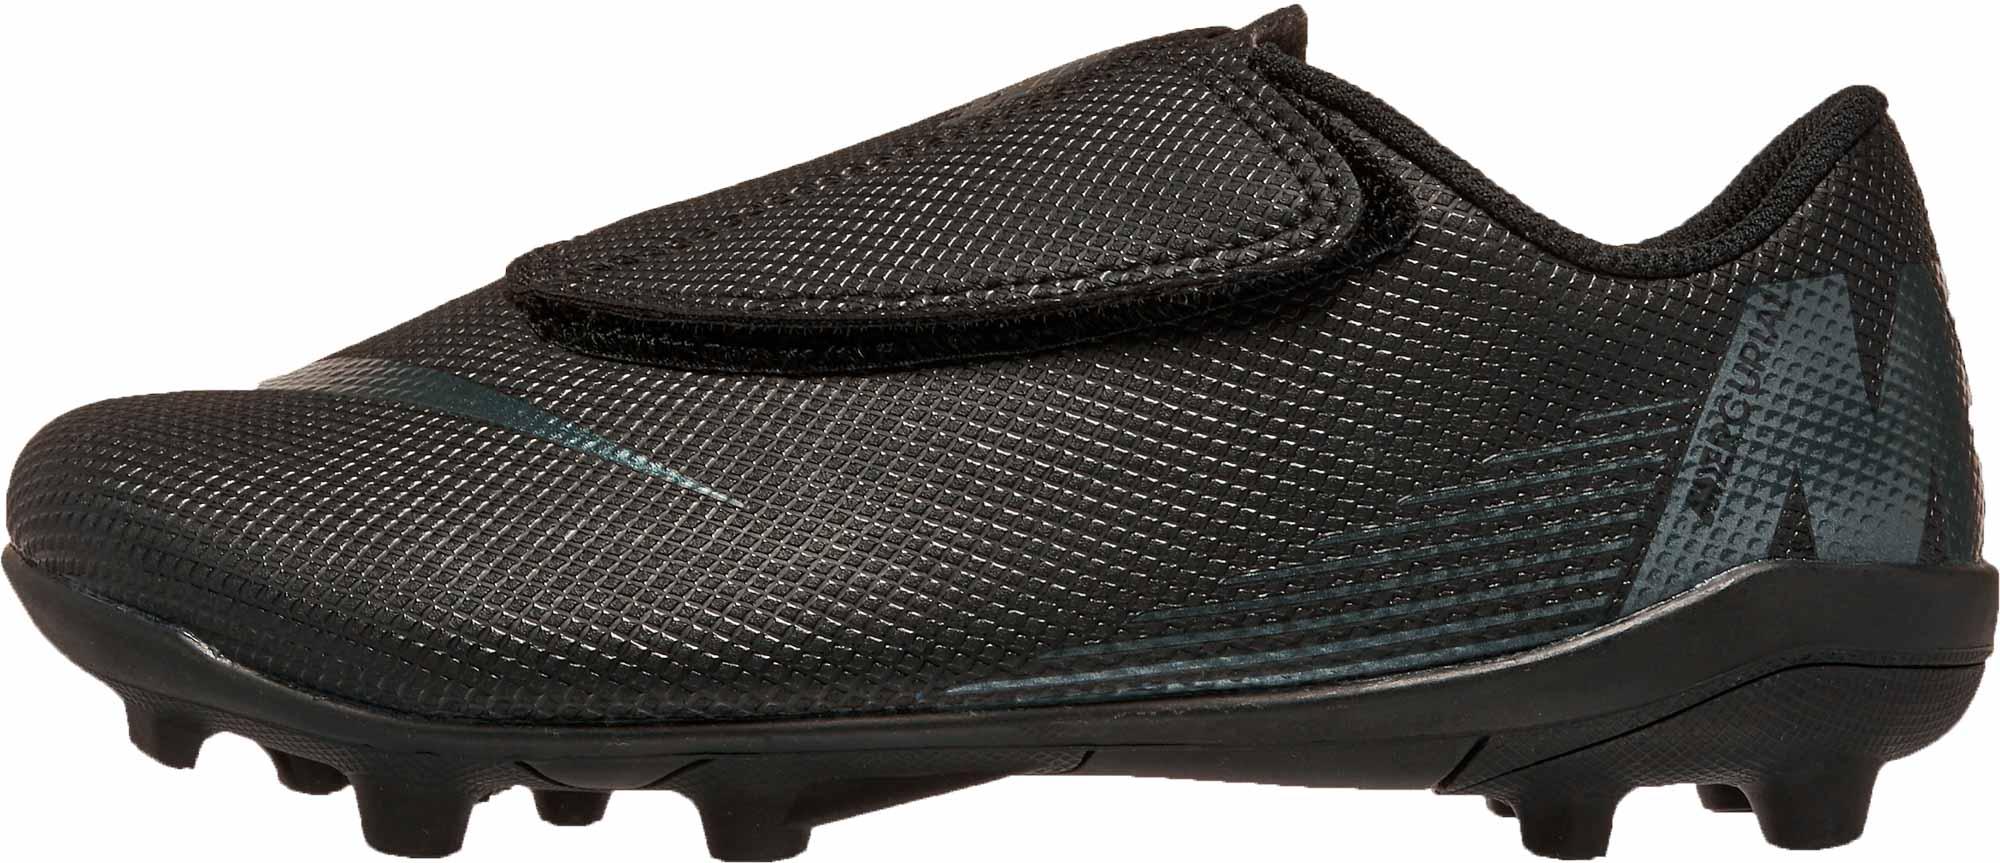 Nike Mercurial Vapor 12 Club MG (velcro